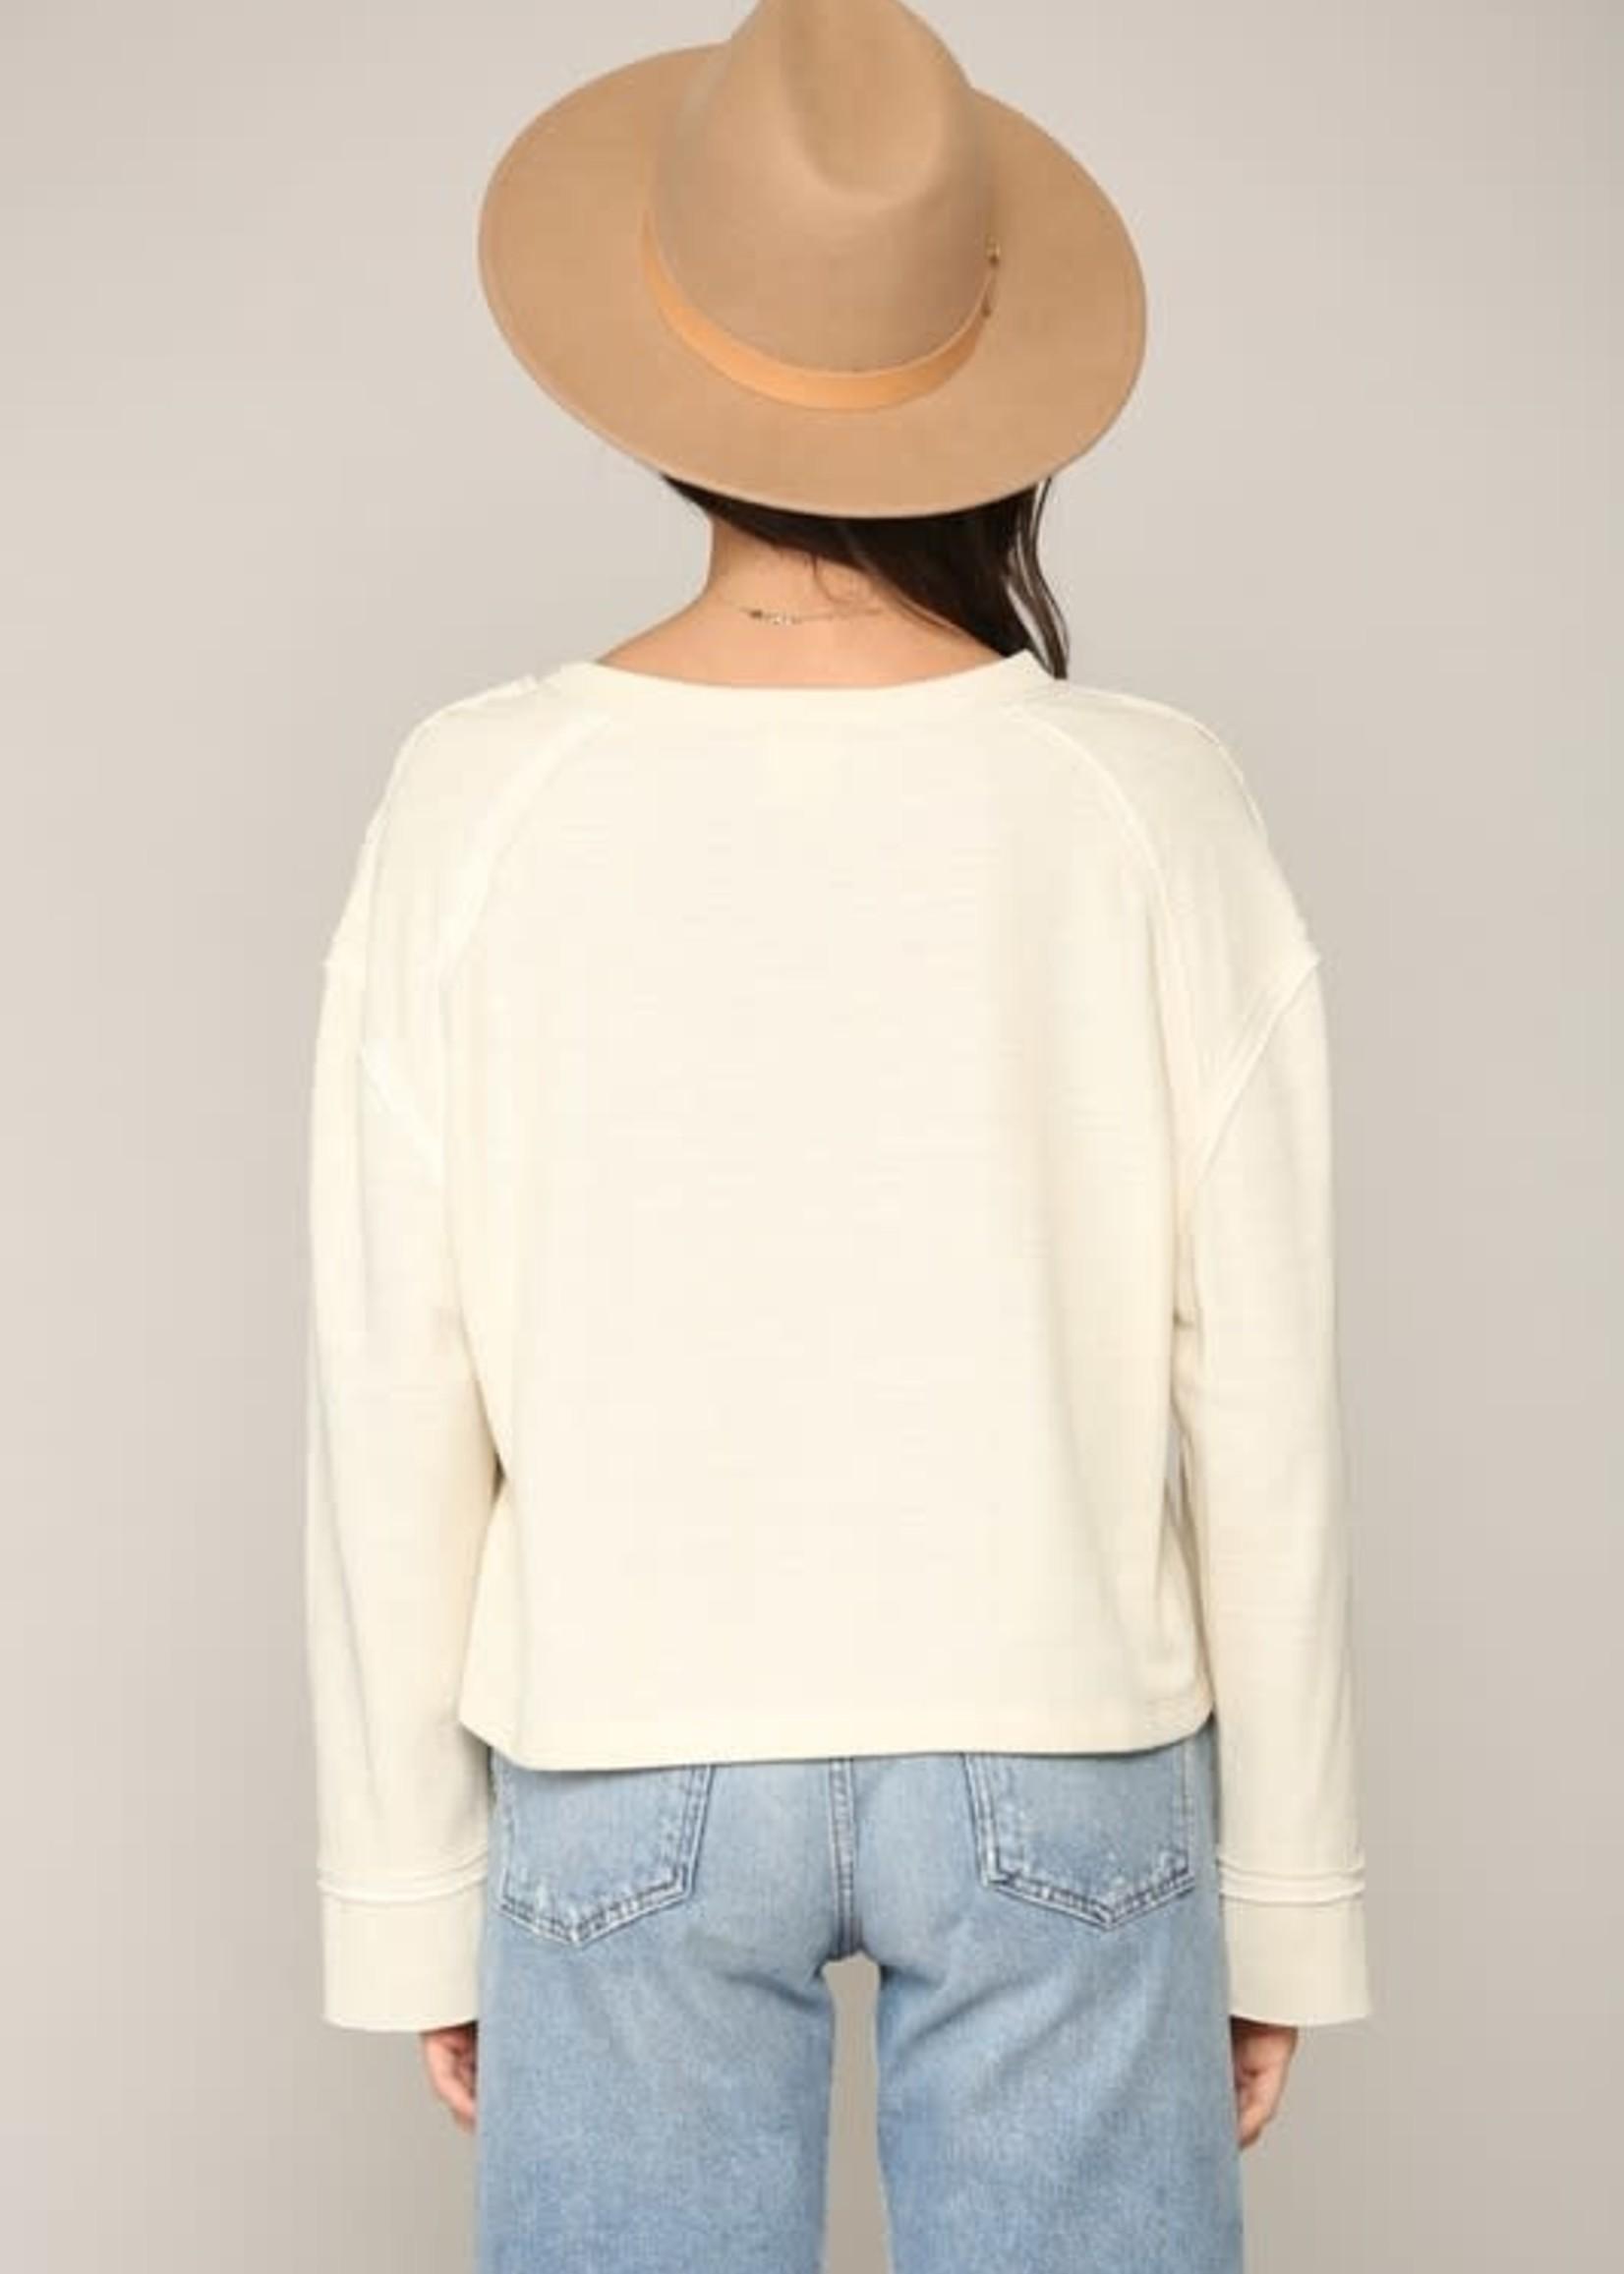 Knit Double Gauze Top - Cream